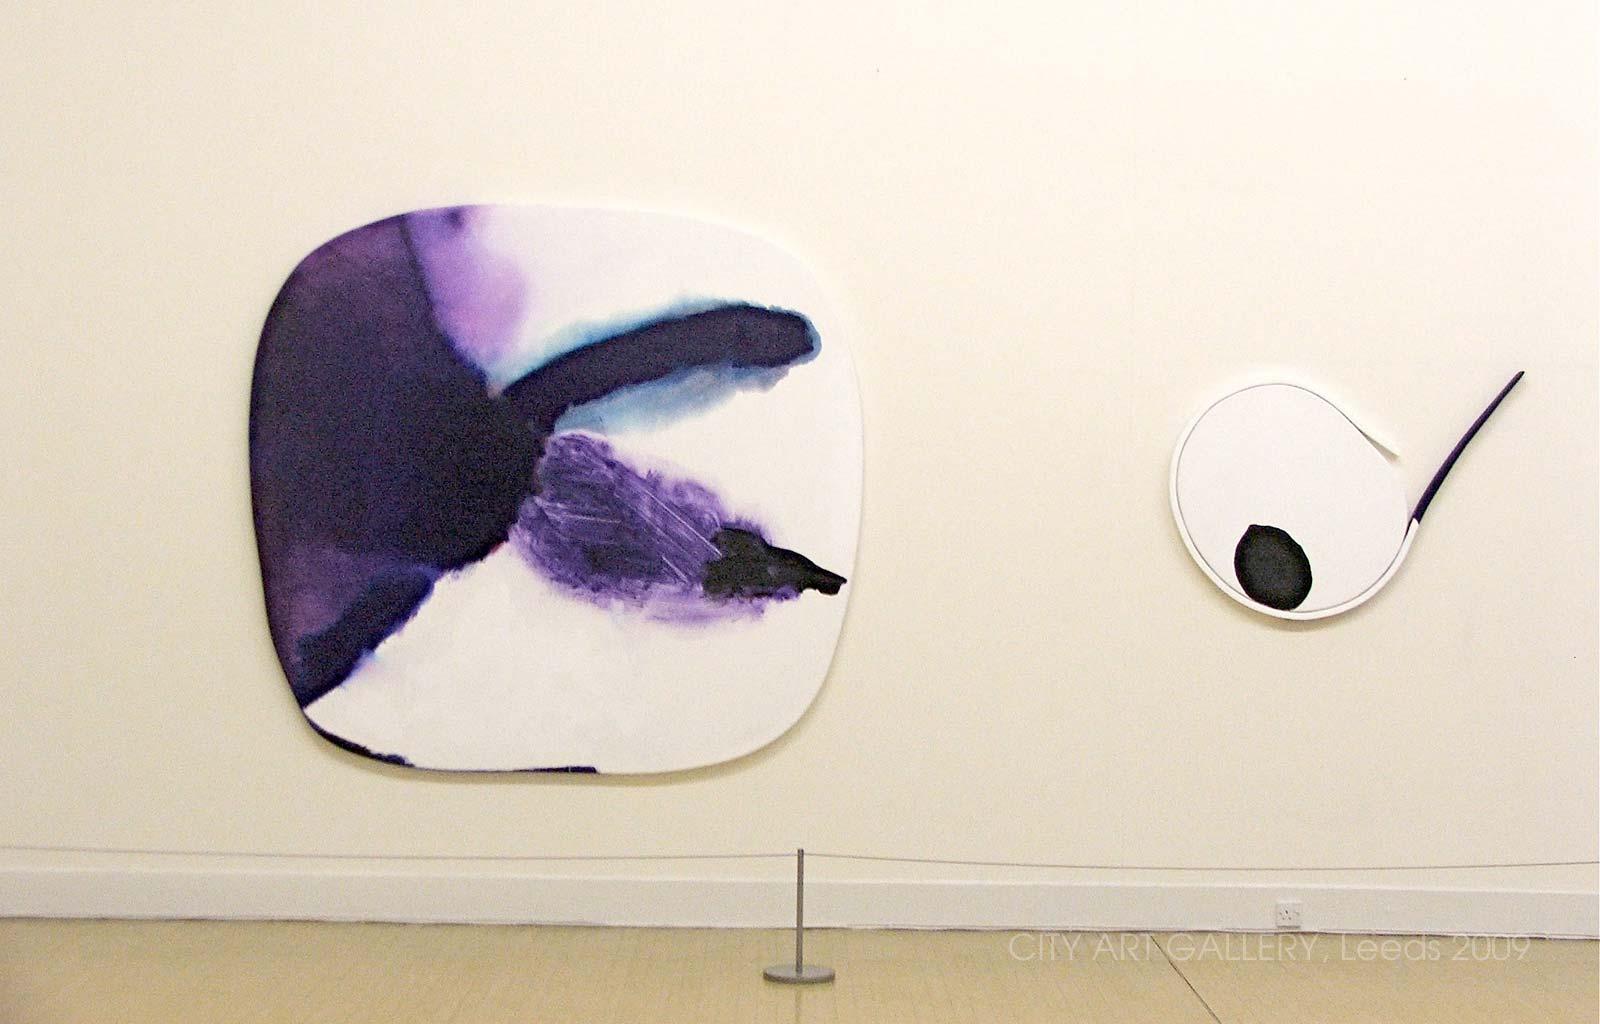 Leeds City Gallery